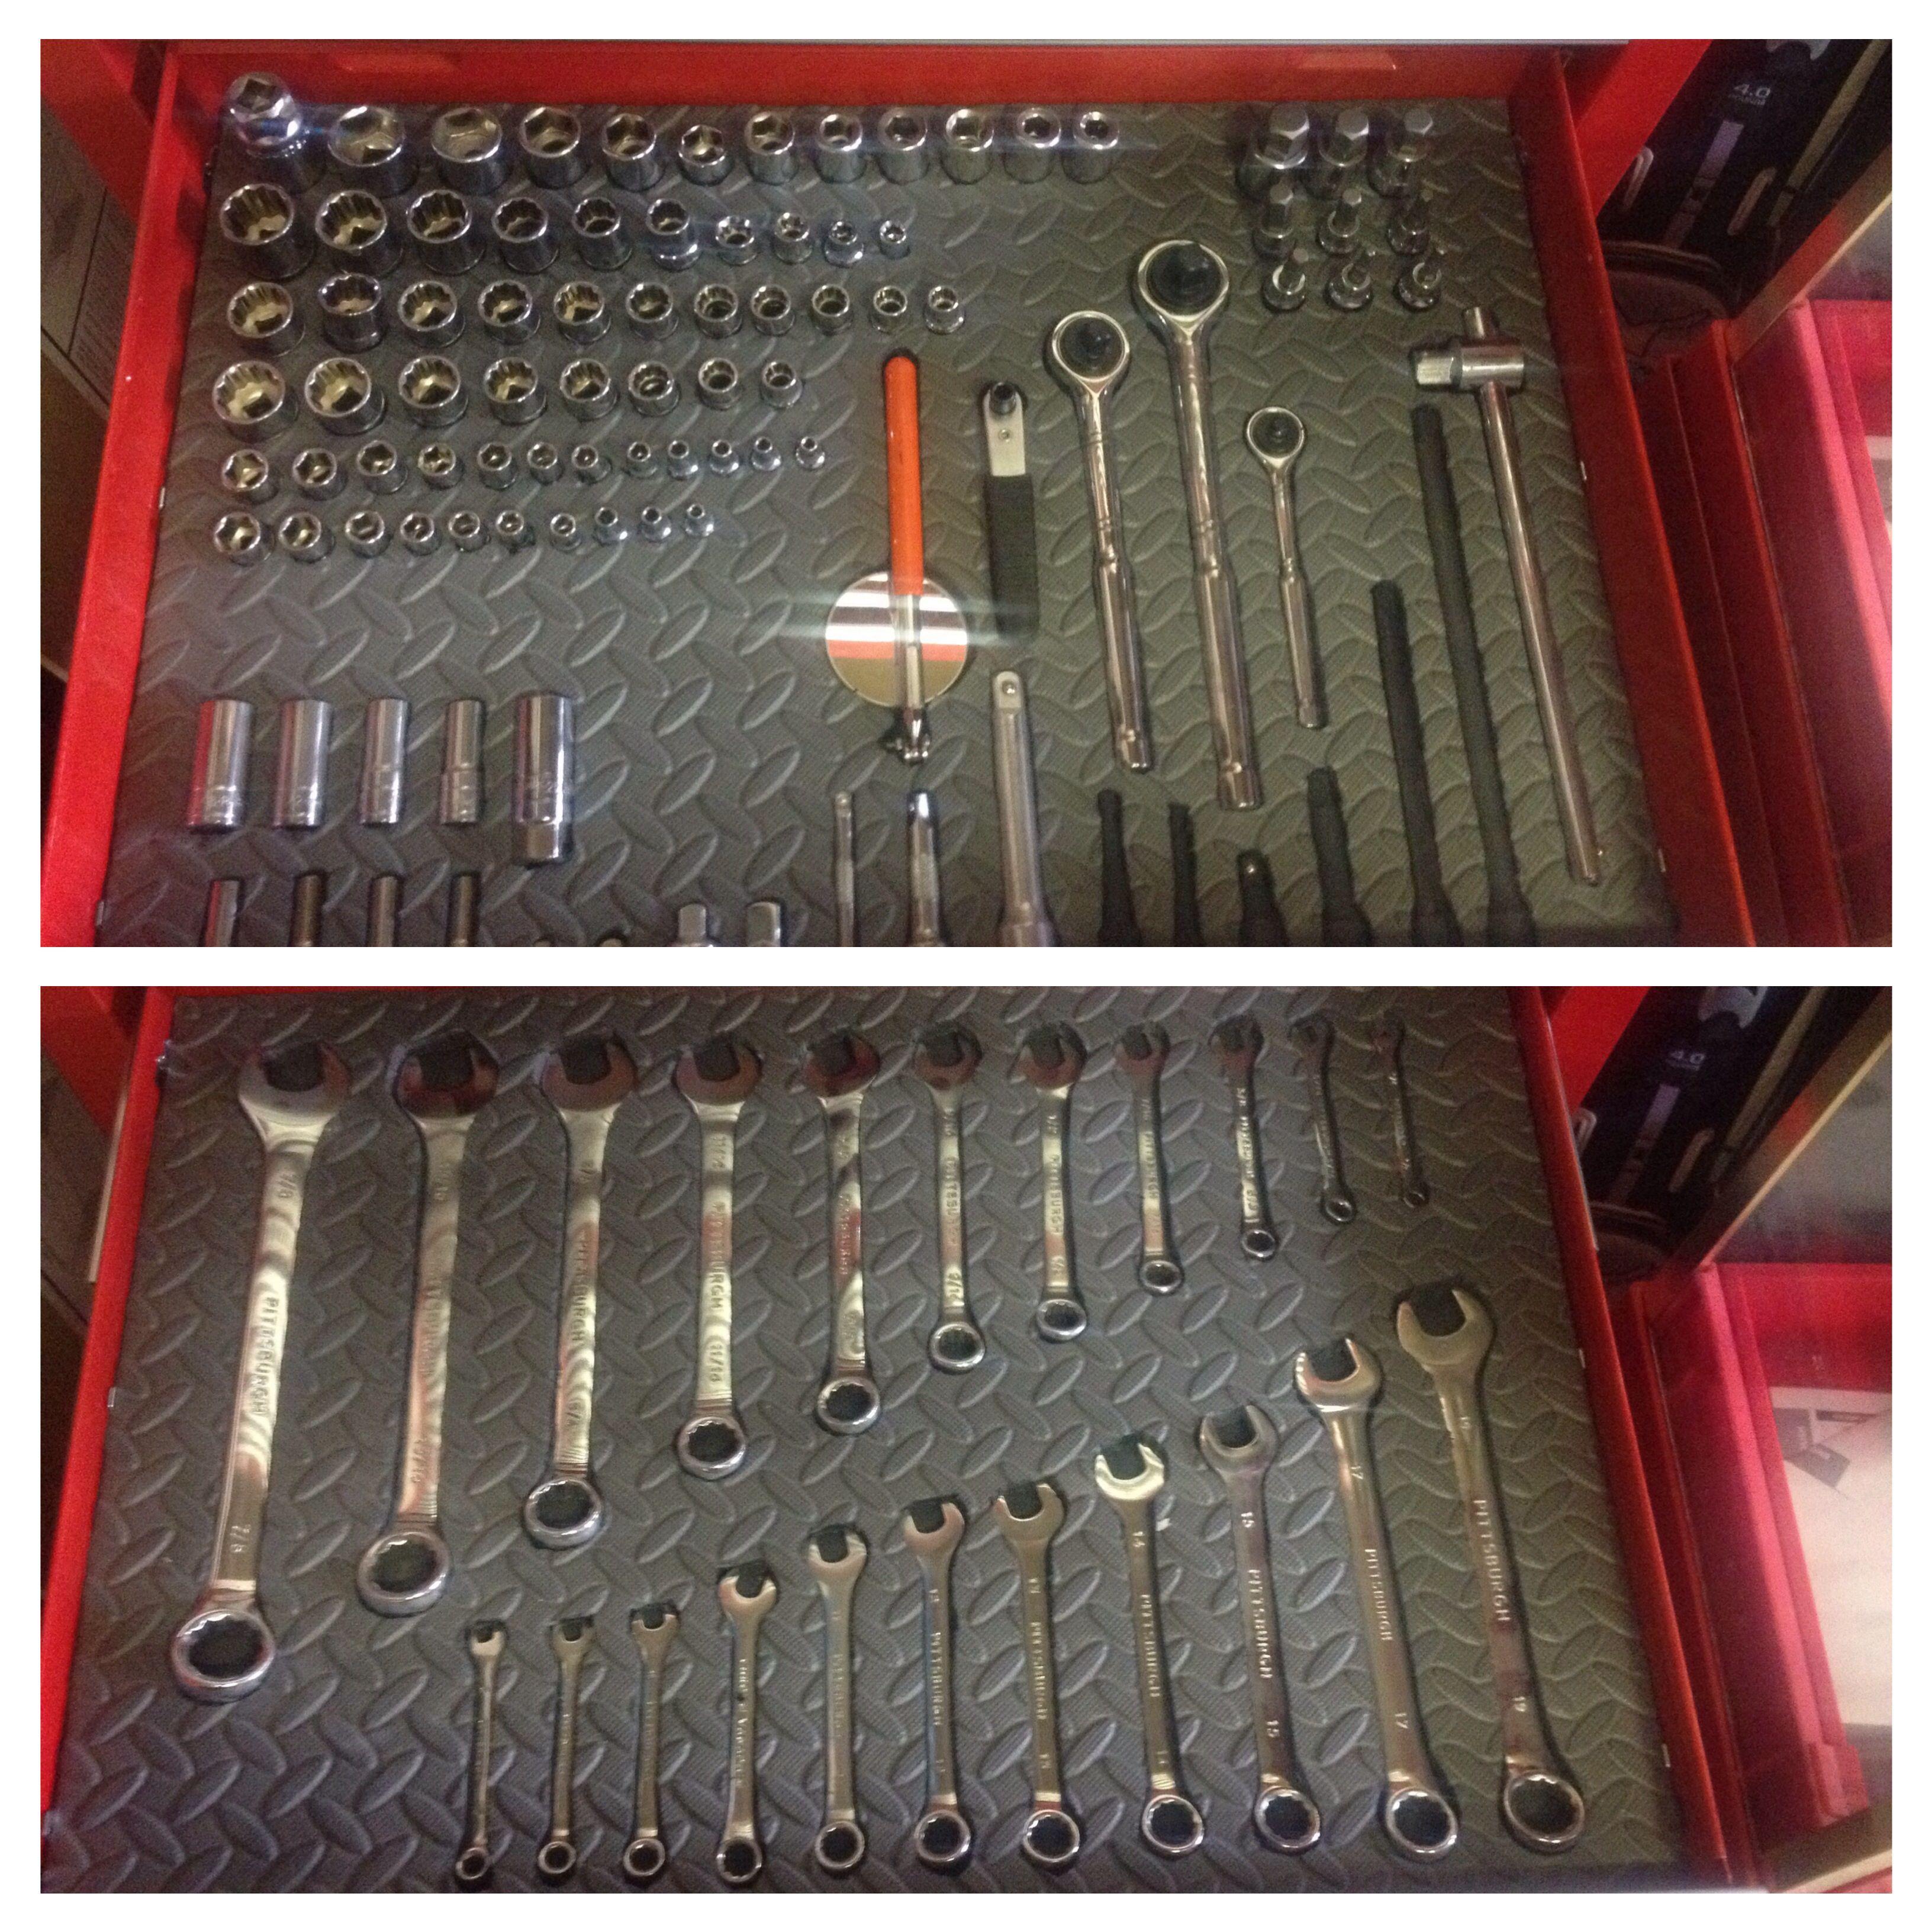 Customized foam insert for tool organization | Chores | Pinterest ...